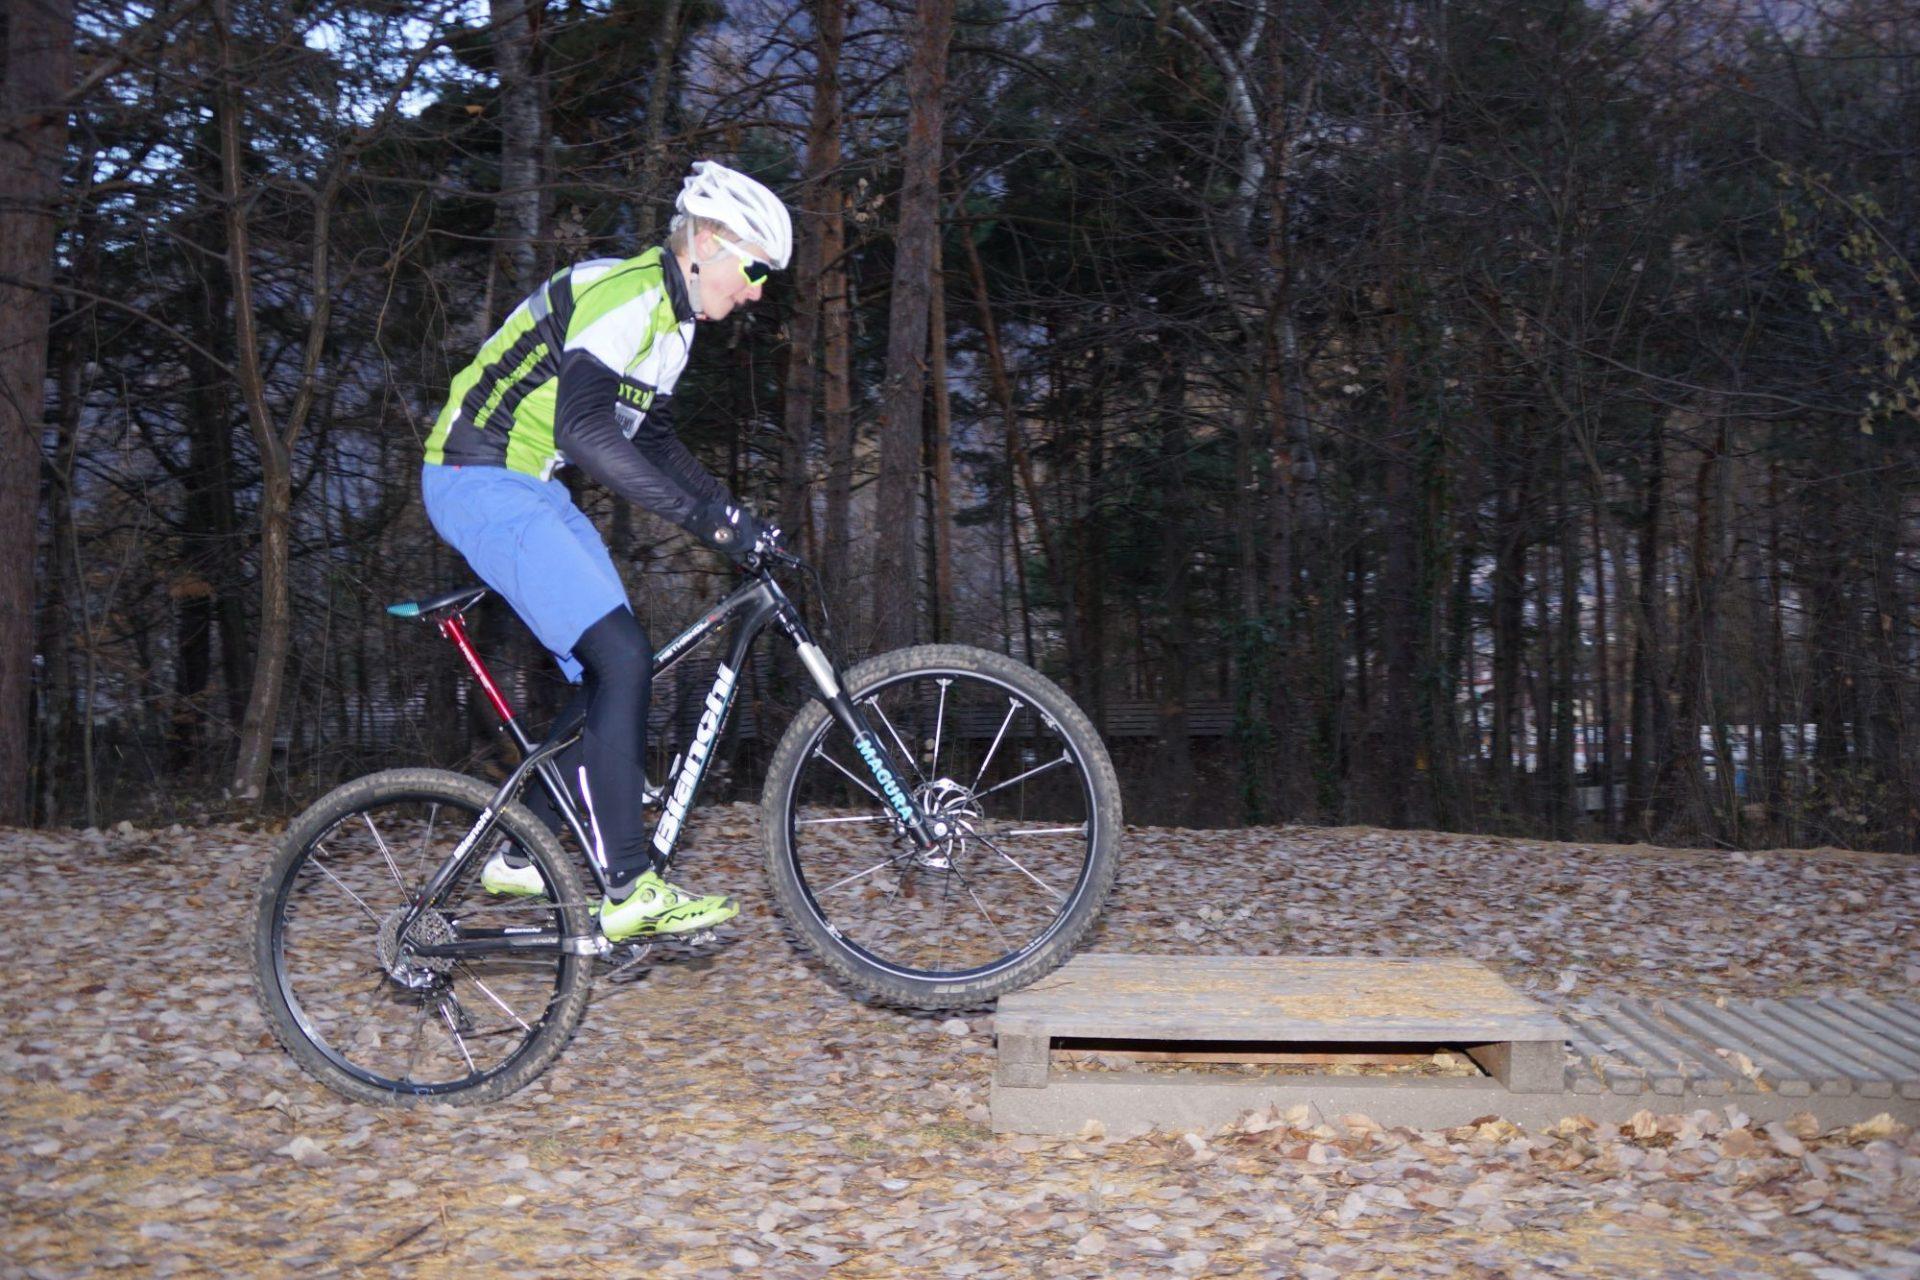 Bergsteigertipp MTB Hindernis 03 I (c) OetziBikeAcqademy